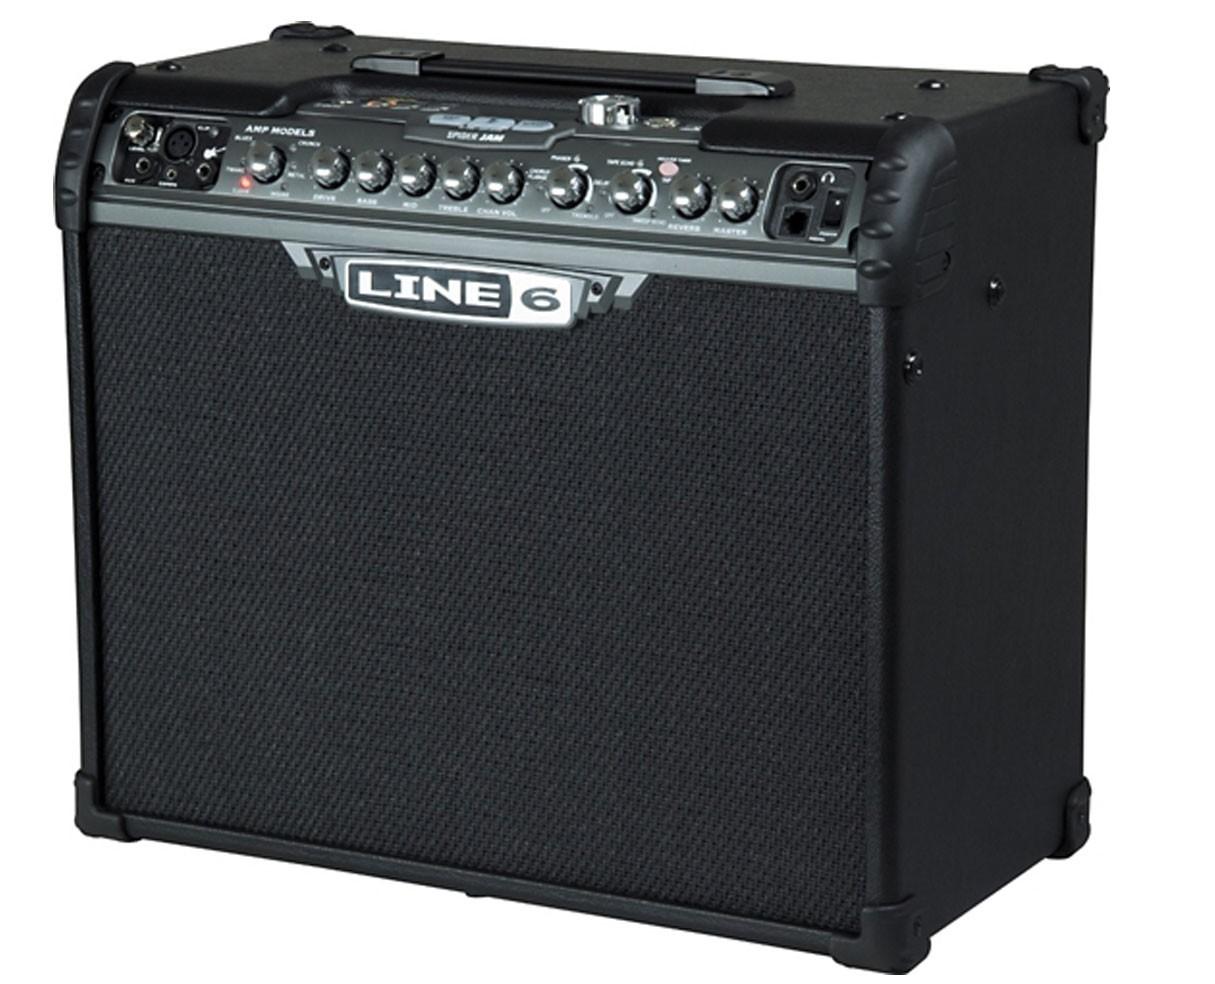 line 6 spider jam 75 watt guitar 1x12 combo amp. Black Bedroom Furniture Sets. Home Design Ideas